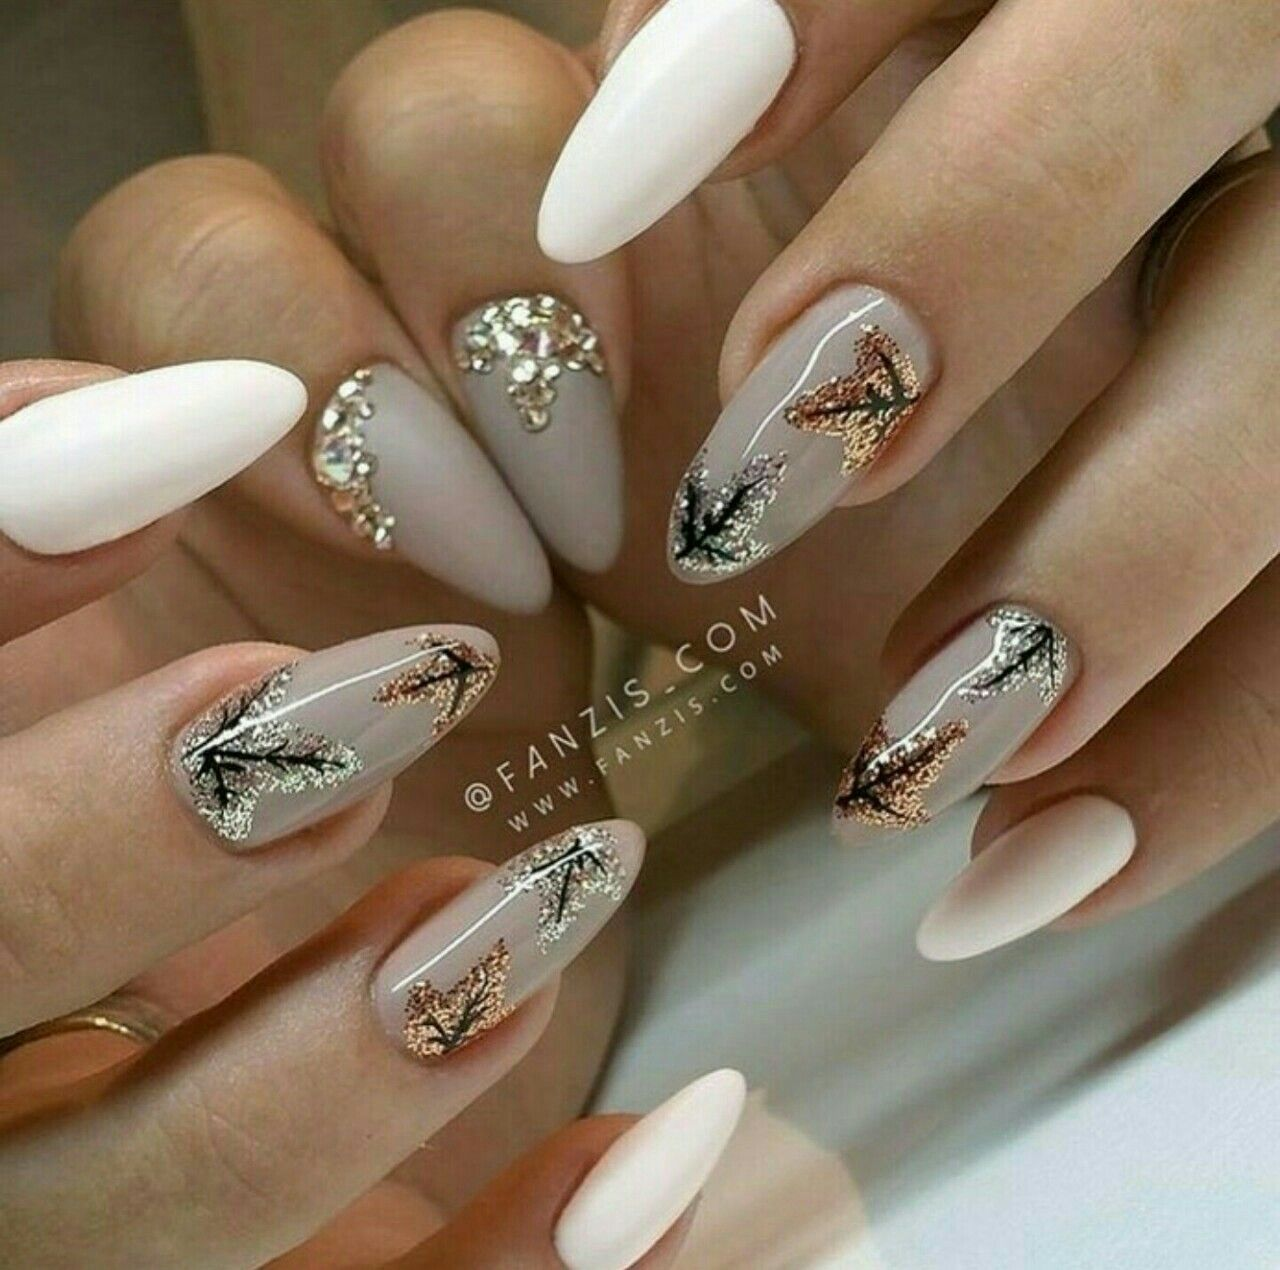 Pin von Keiko Taisho auf Nails | Herbst acrylnägel ...